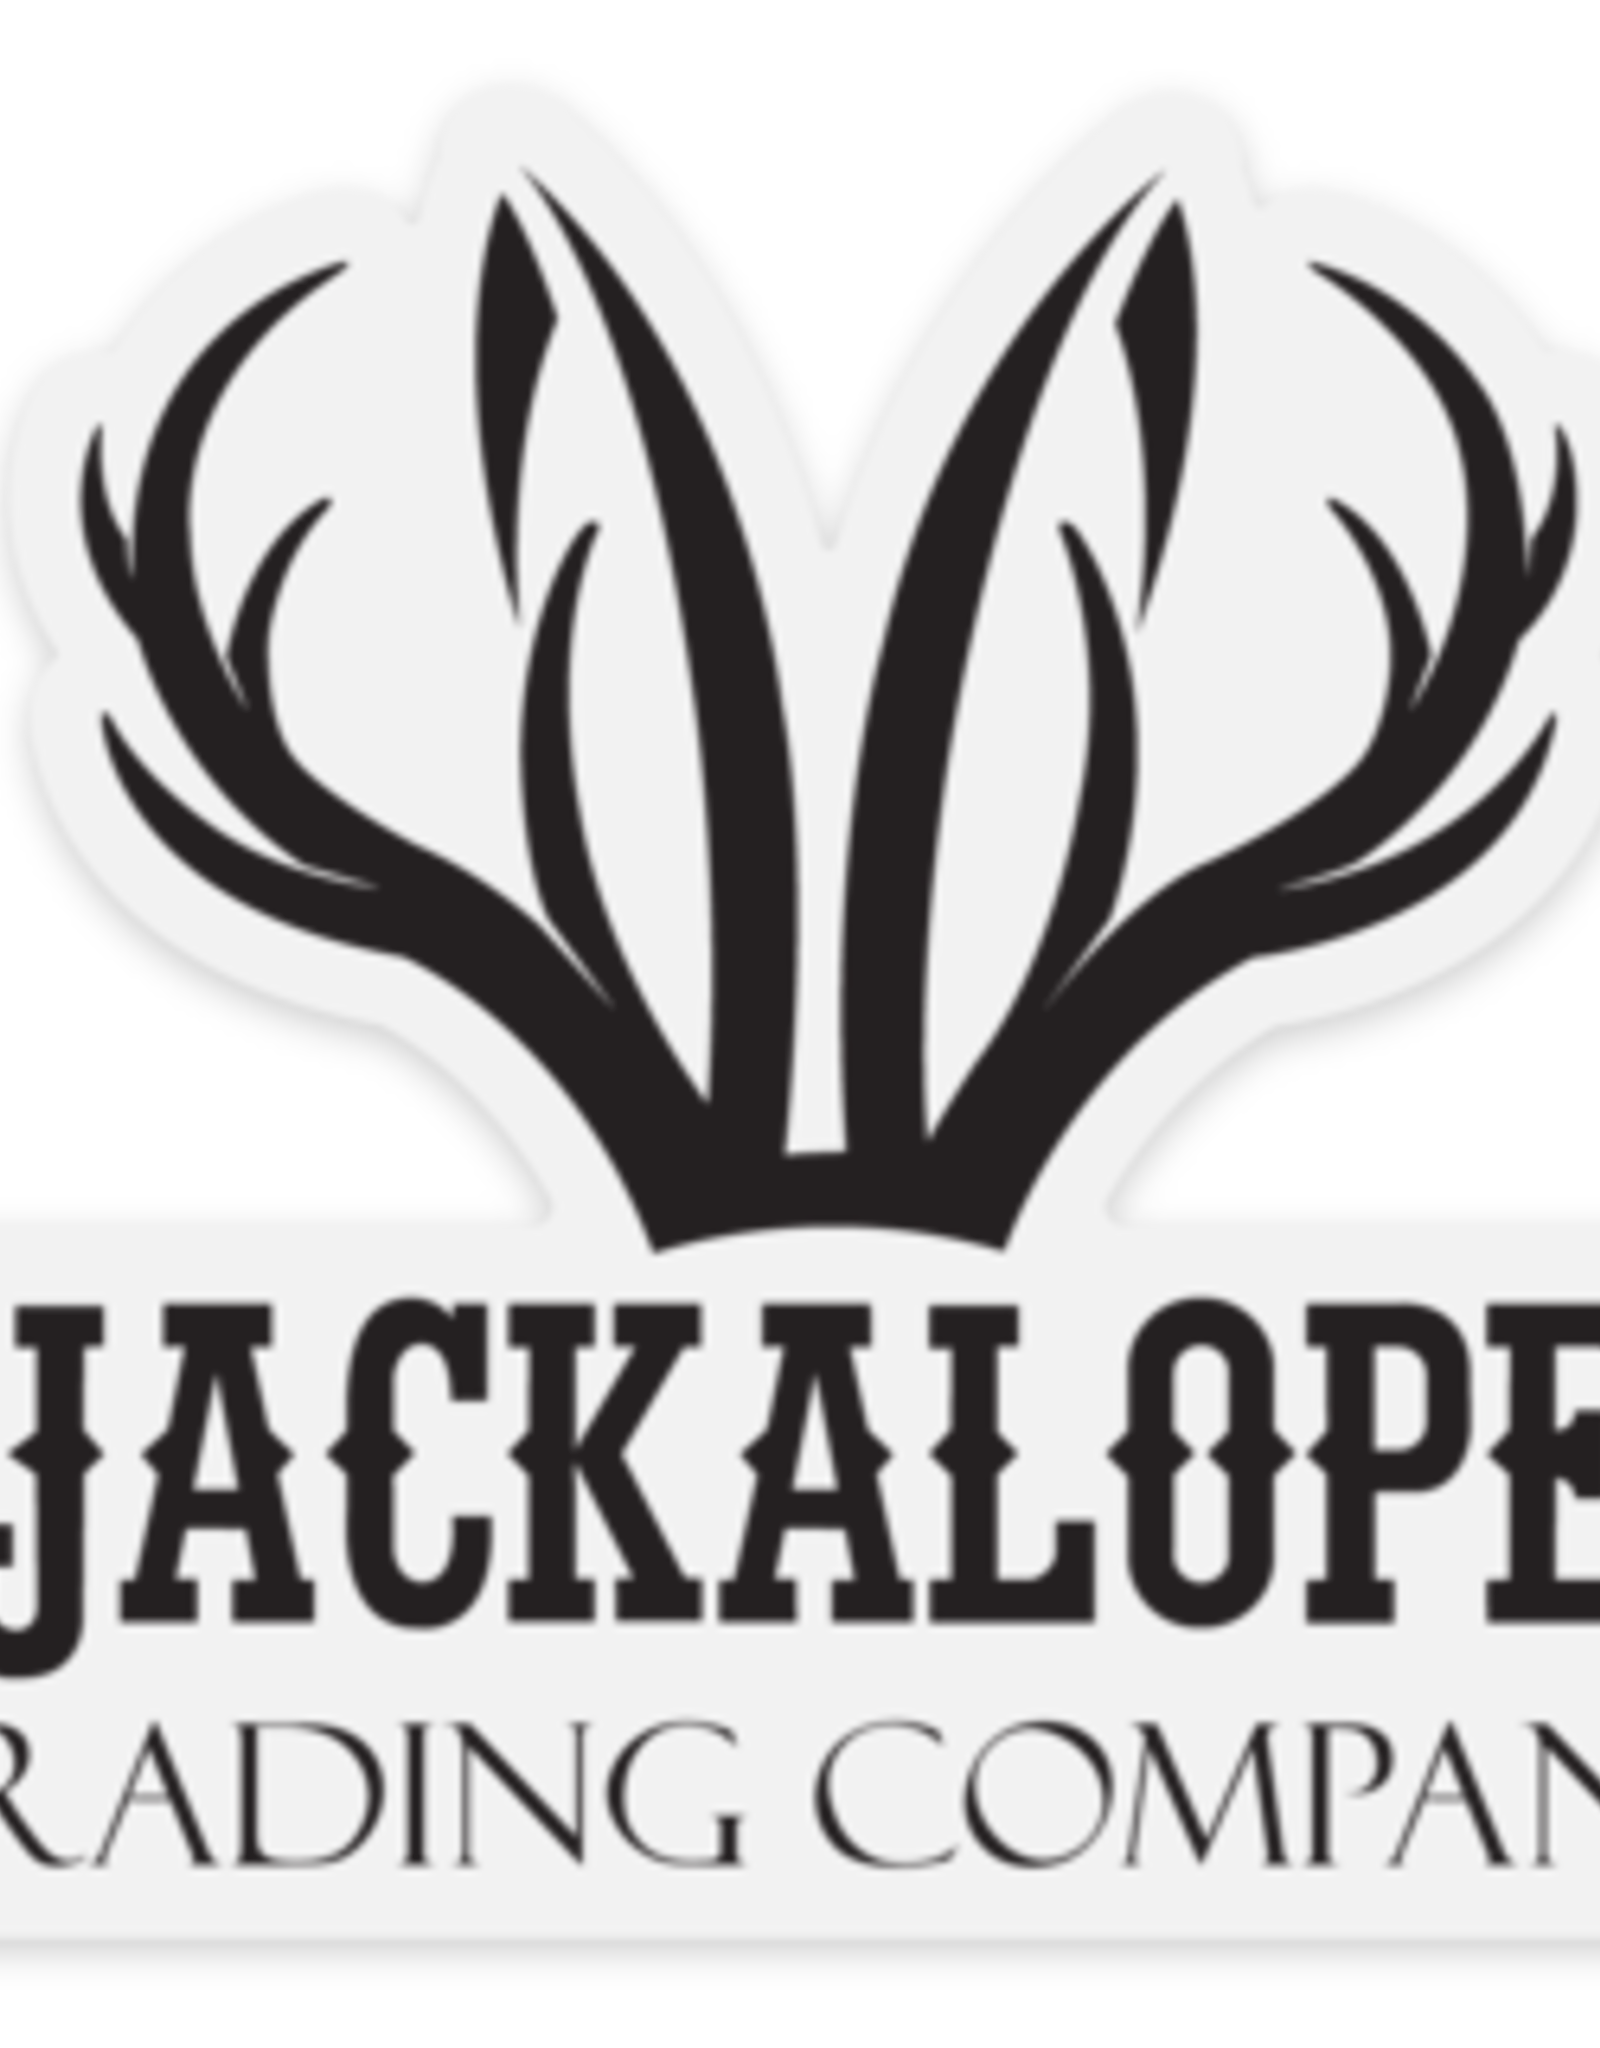 Clear Jackalope Logo Stickers